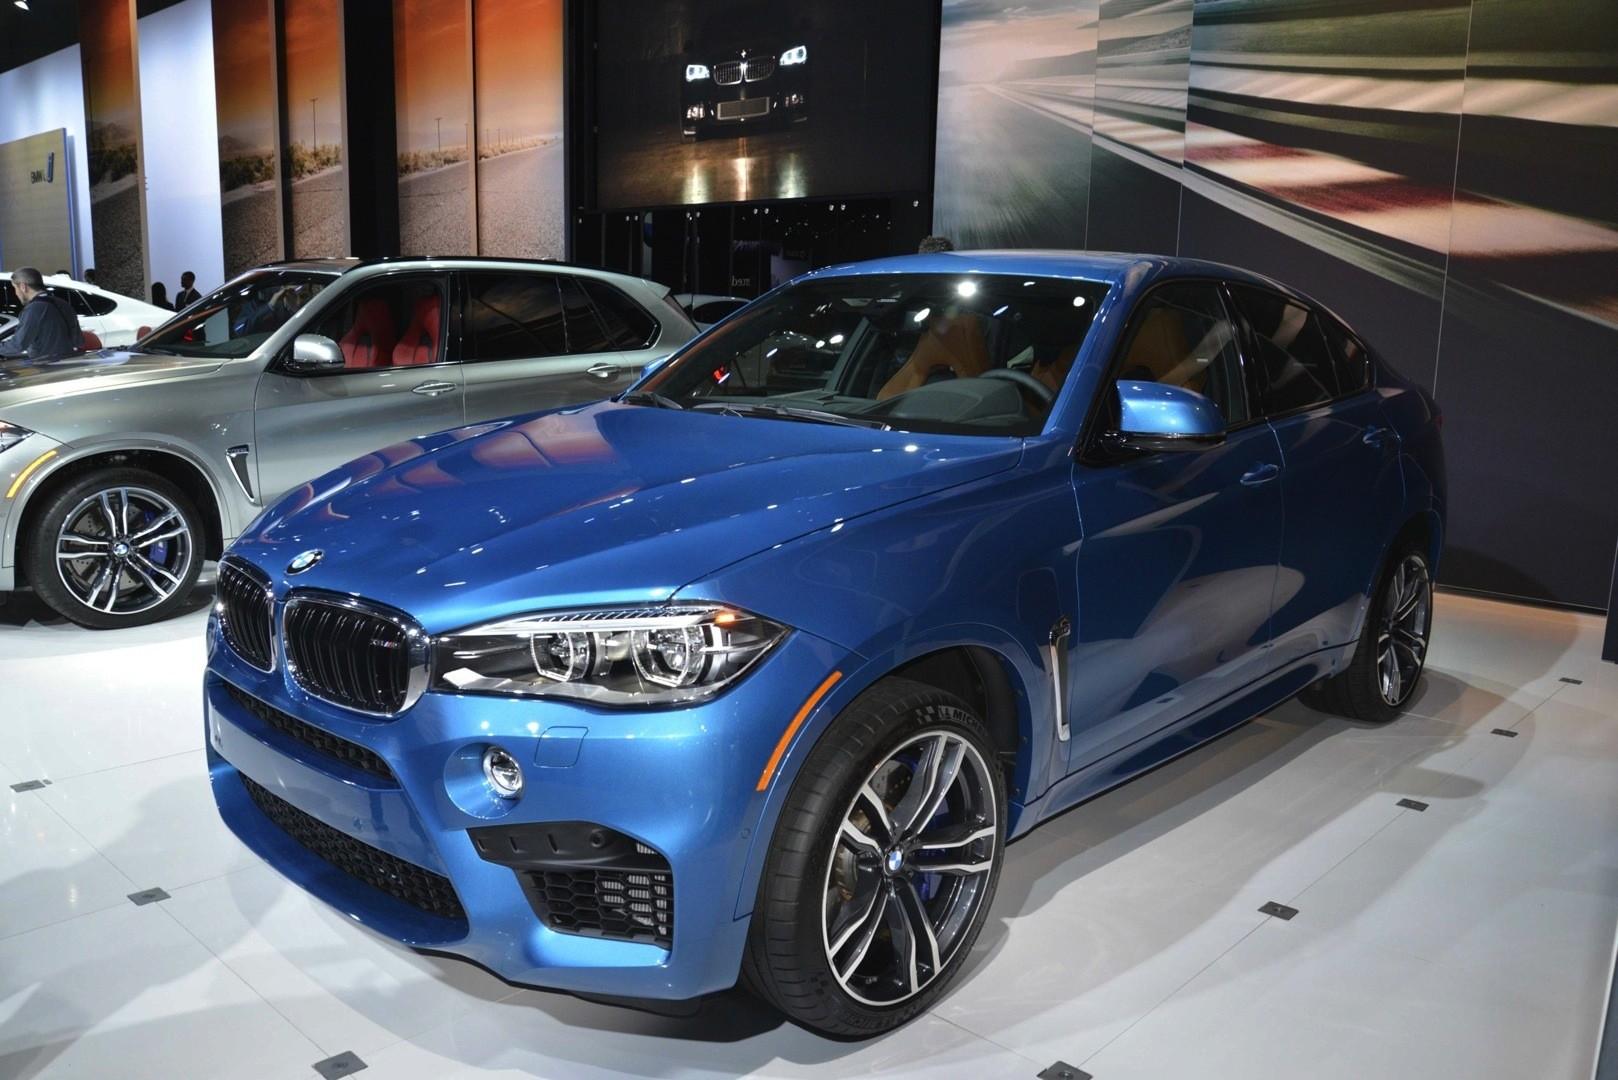 Bmw X5 M And X6 M Show Up In La With New Colors Live Photos Autoevolution